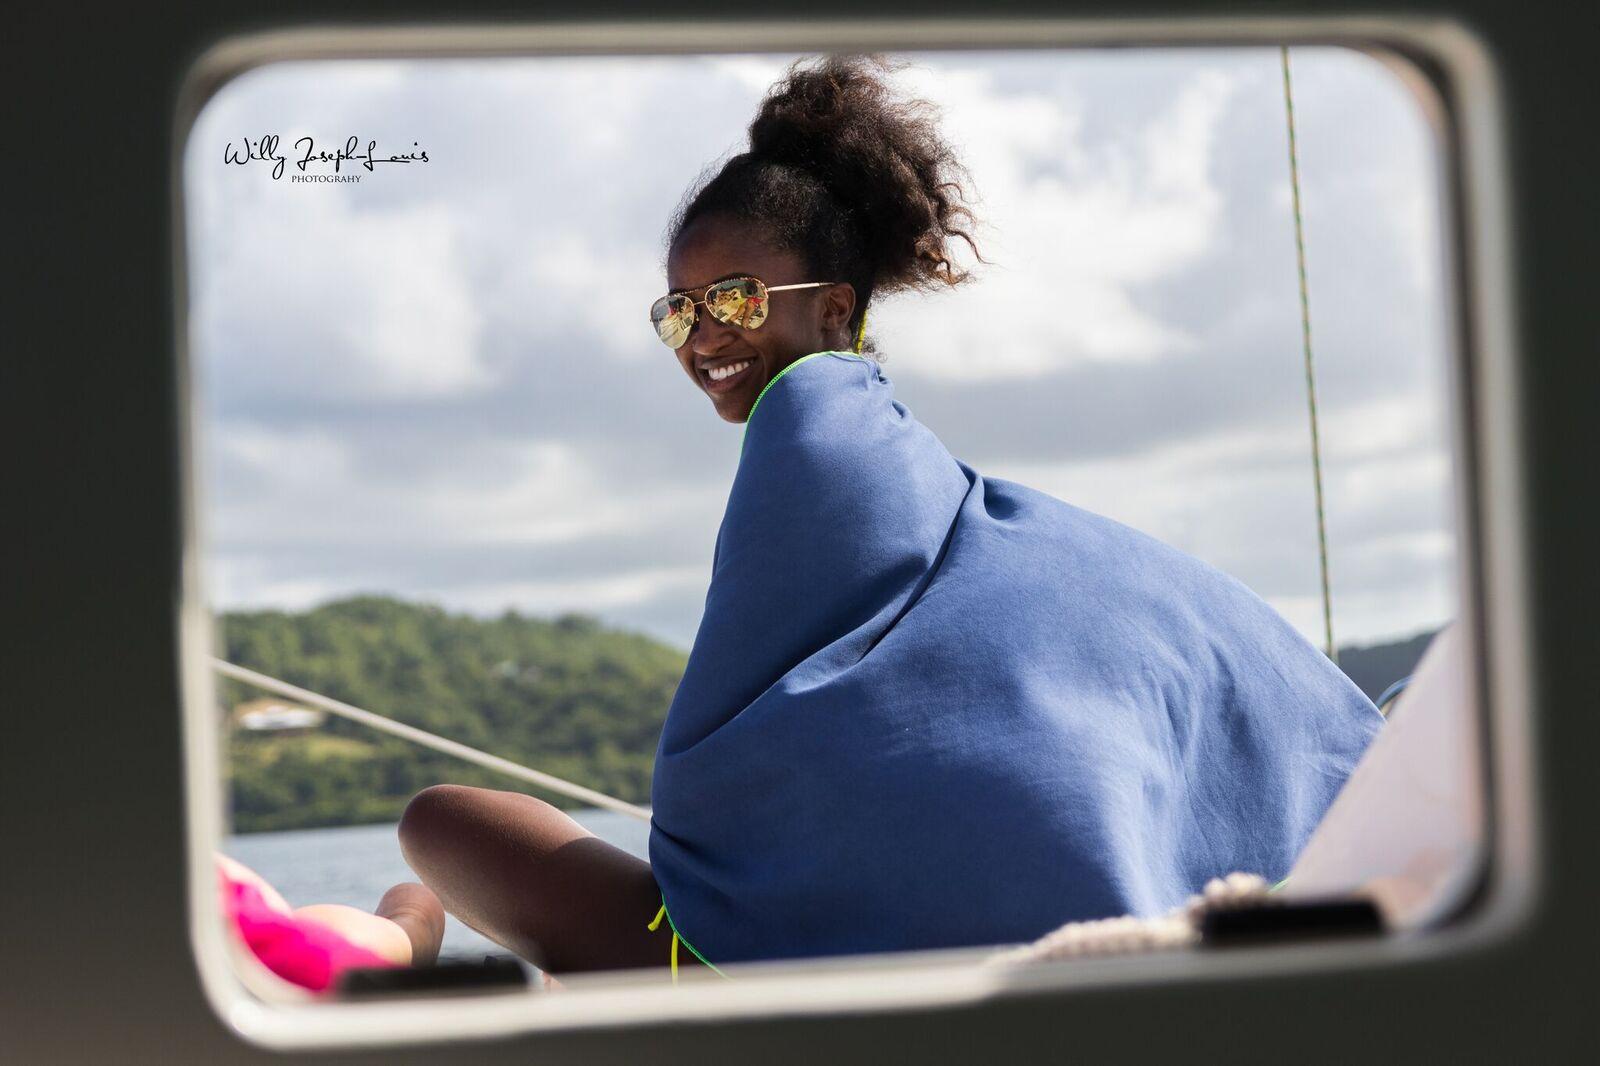 Francesca on boat.jpeg